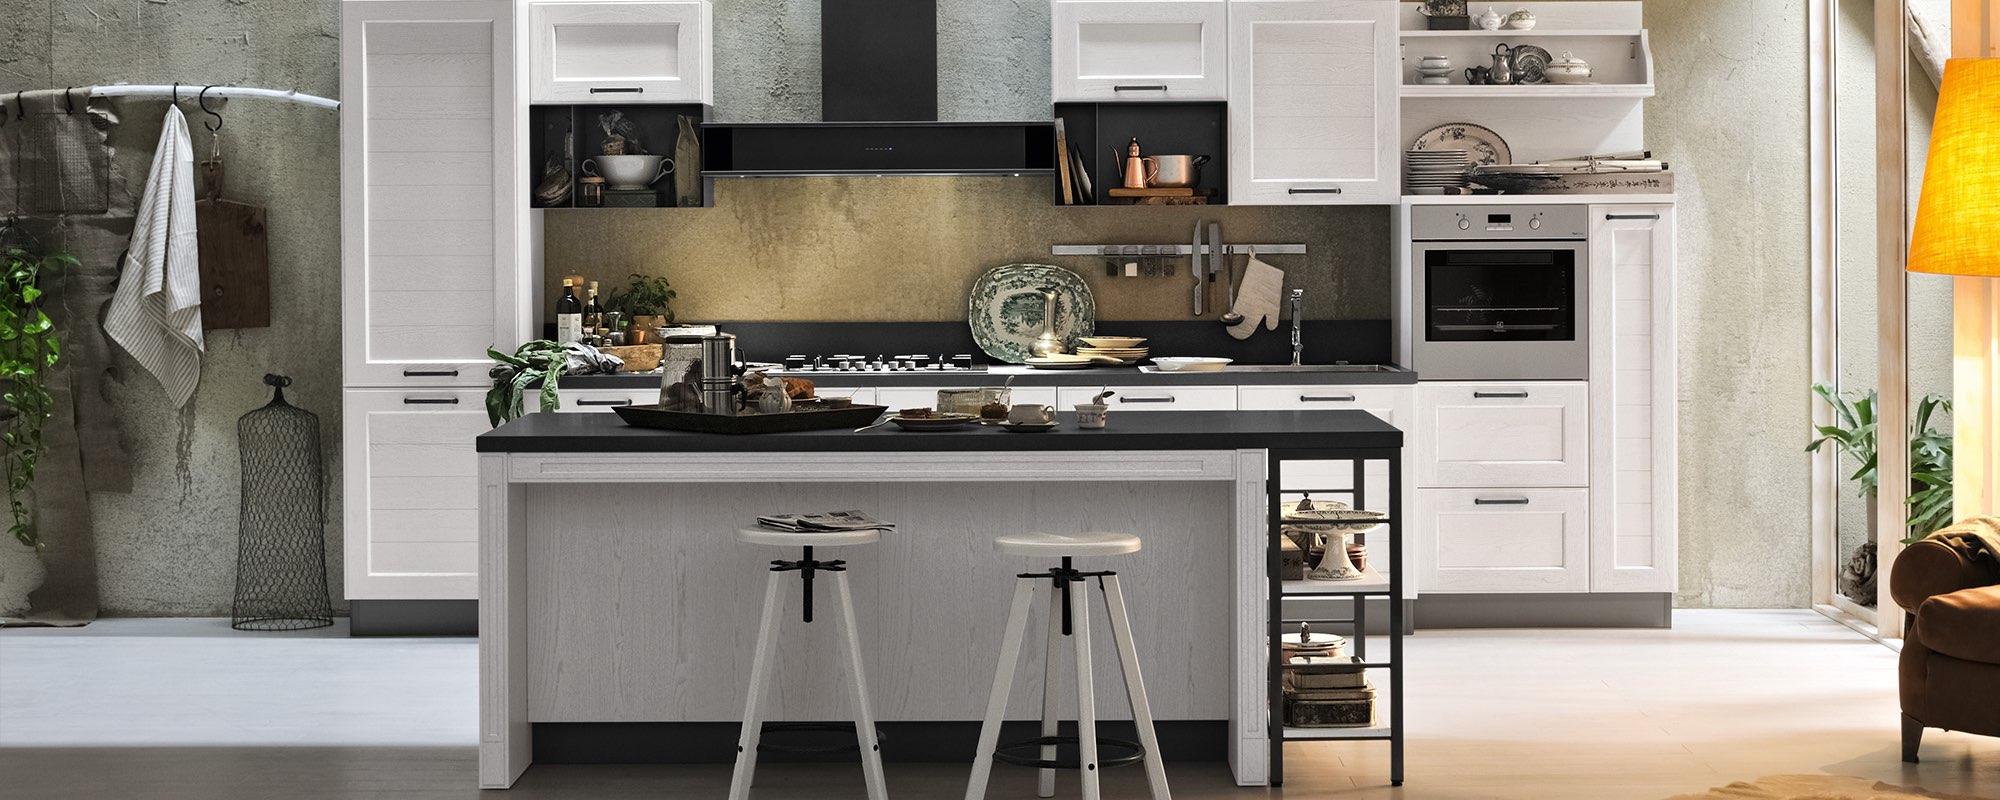 vista frontale di una cucina moderna in quercia con isola - YORK